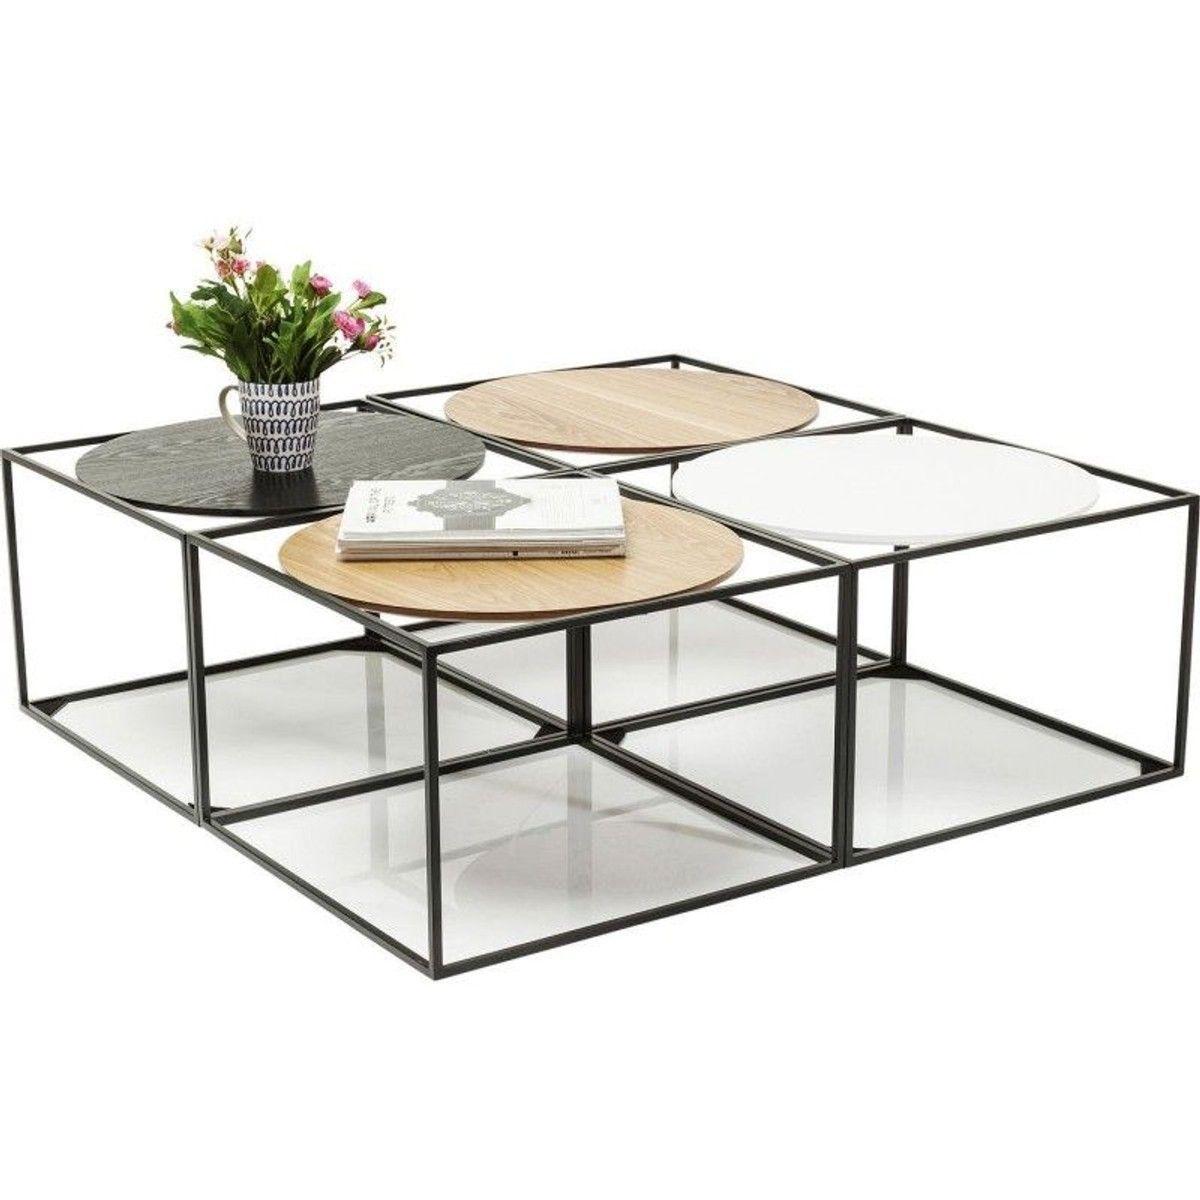 Table Basse Kare Design.Table Basse Quattro Circles 100x100cm Kare Design Taille